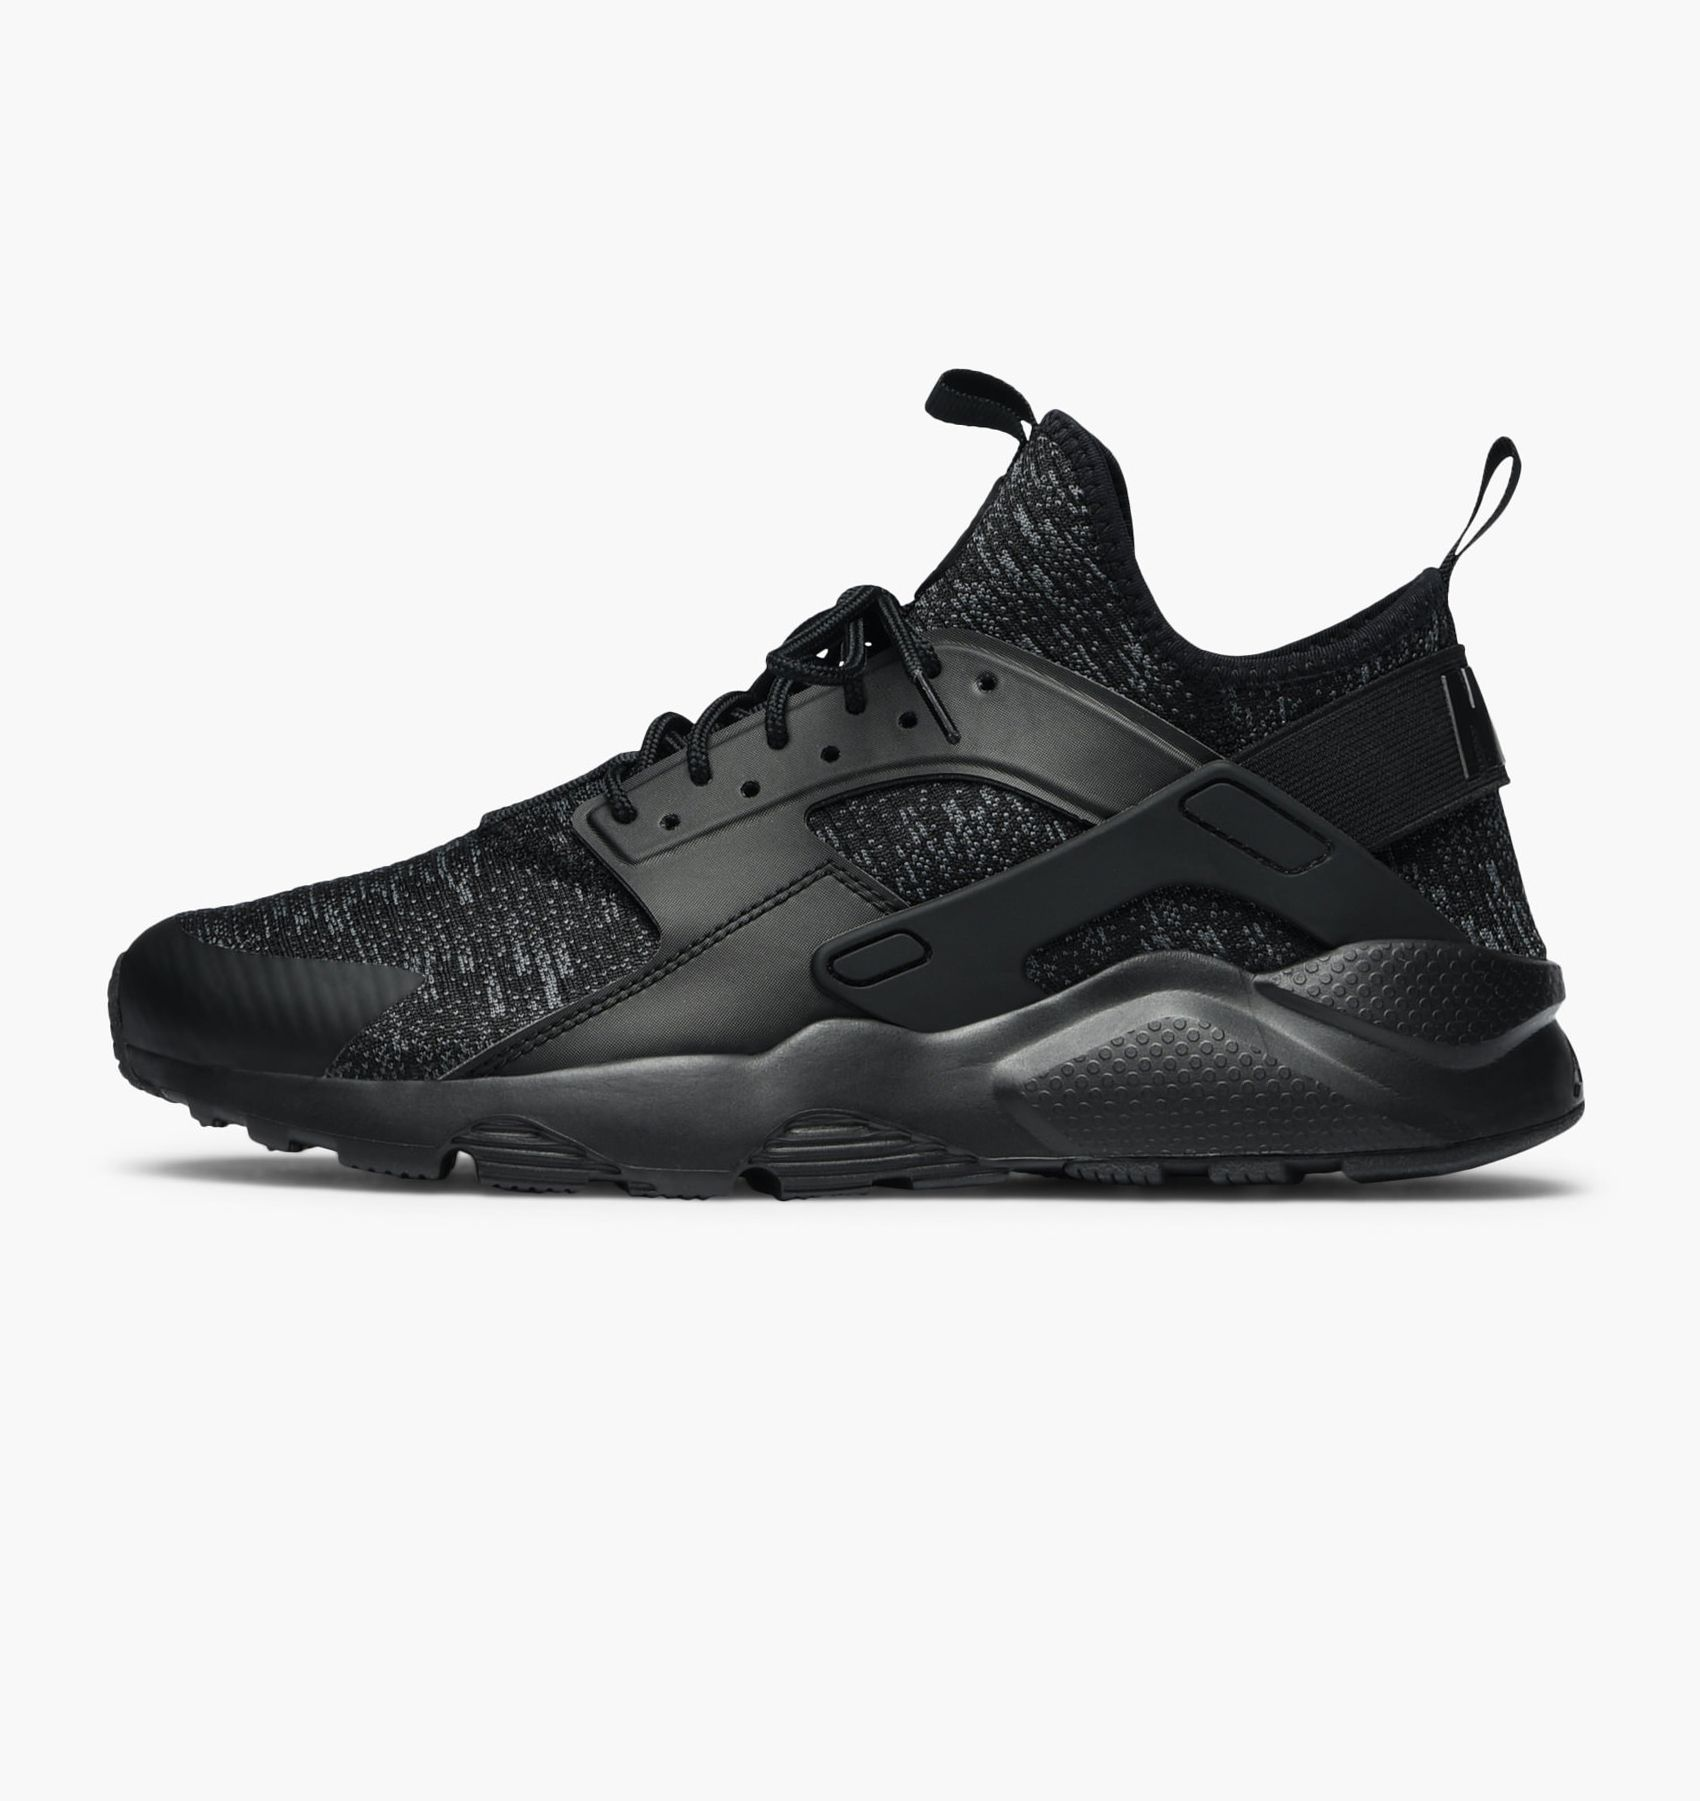 0628341dbd85 caliroots.com Air Huarache Run Ultra SE Nike 875841-006 402800 ...